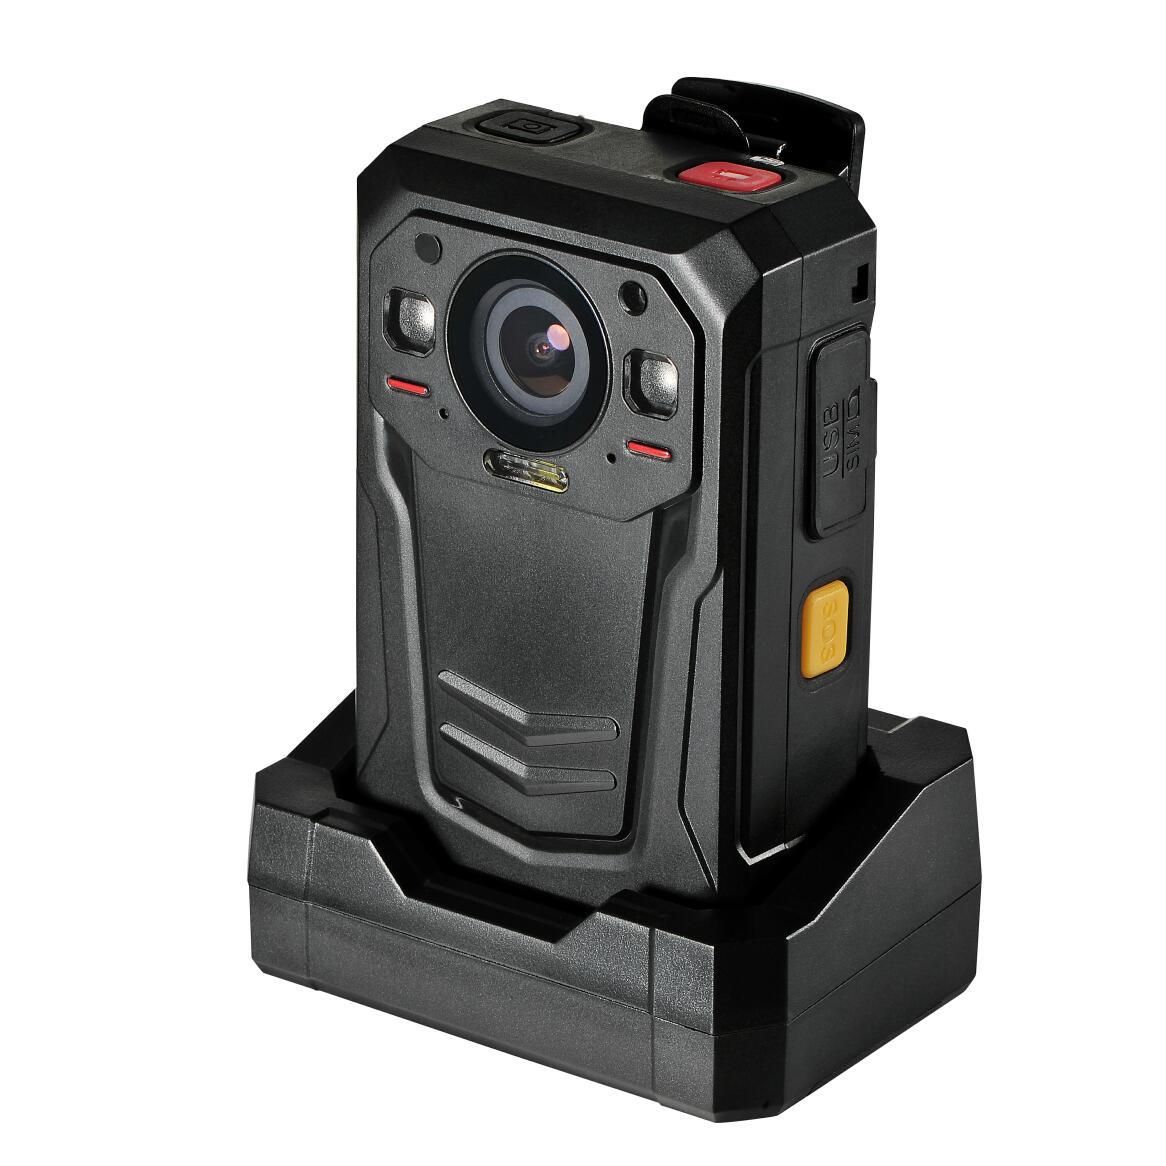 1080P 3G 4G GPS WIFI الشرطة الجسم البالية الفيديو كاميرا